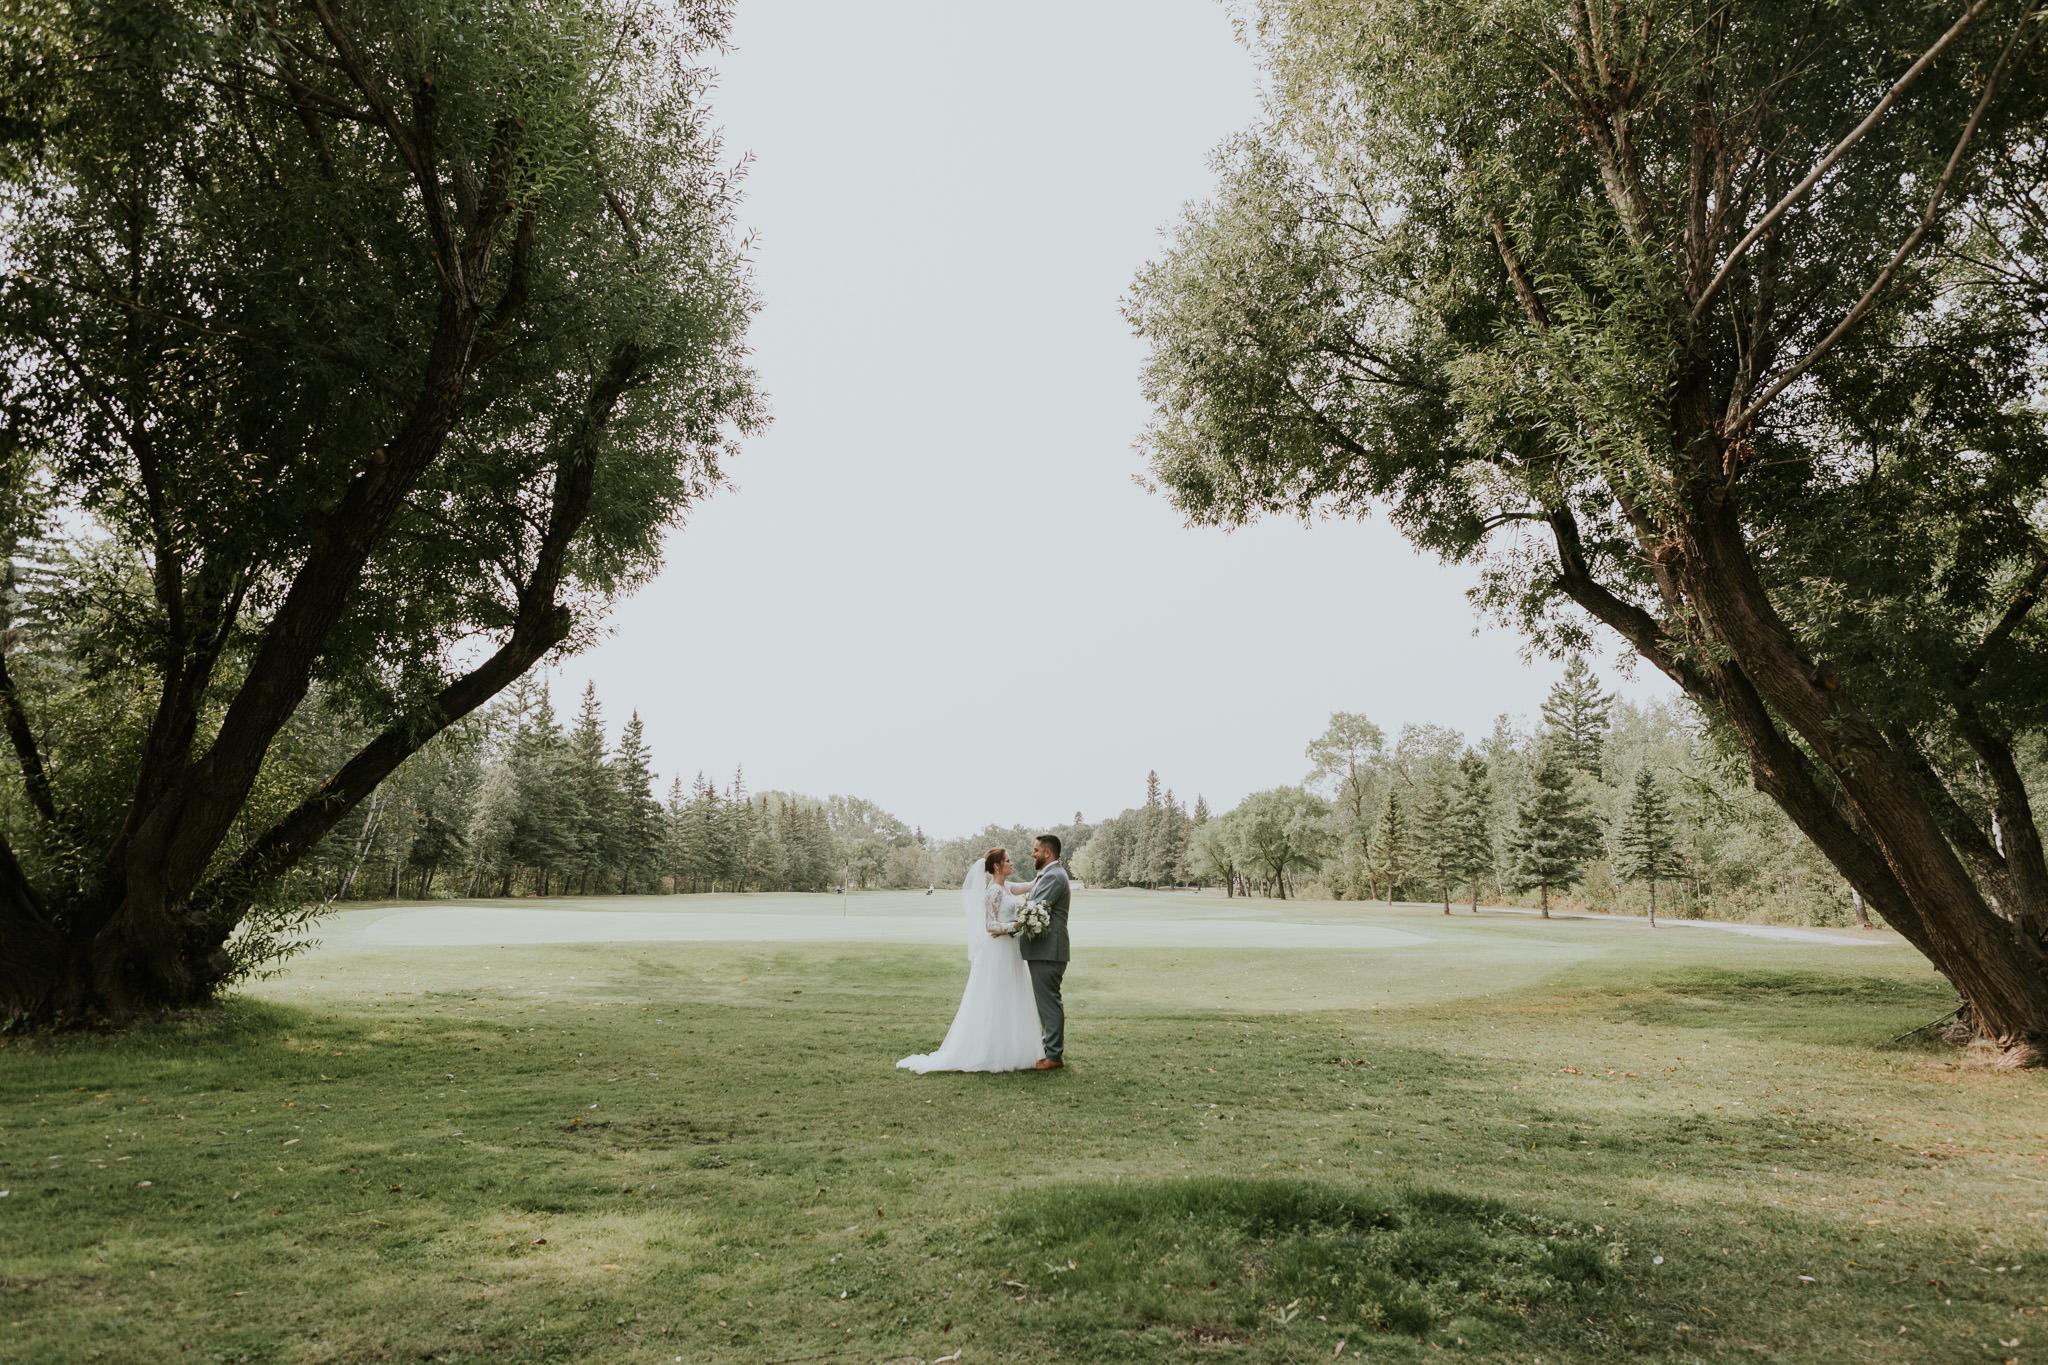 pine-ridge-golf-course-winnipeg-wedding-40.jpg